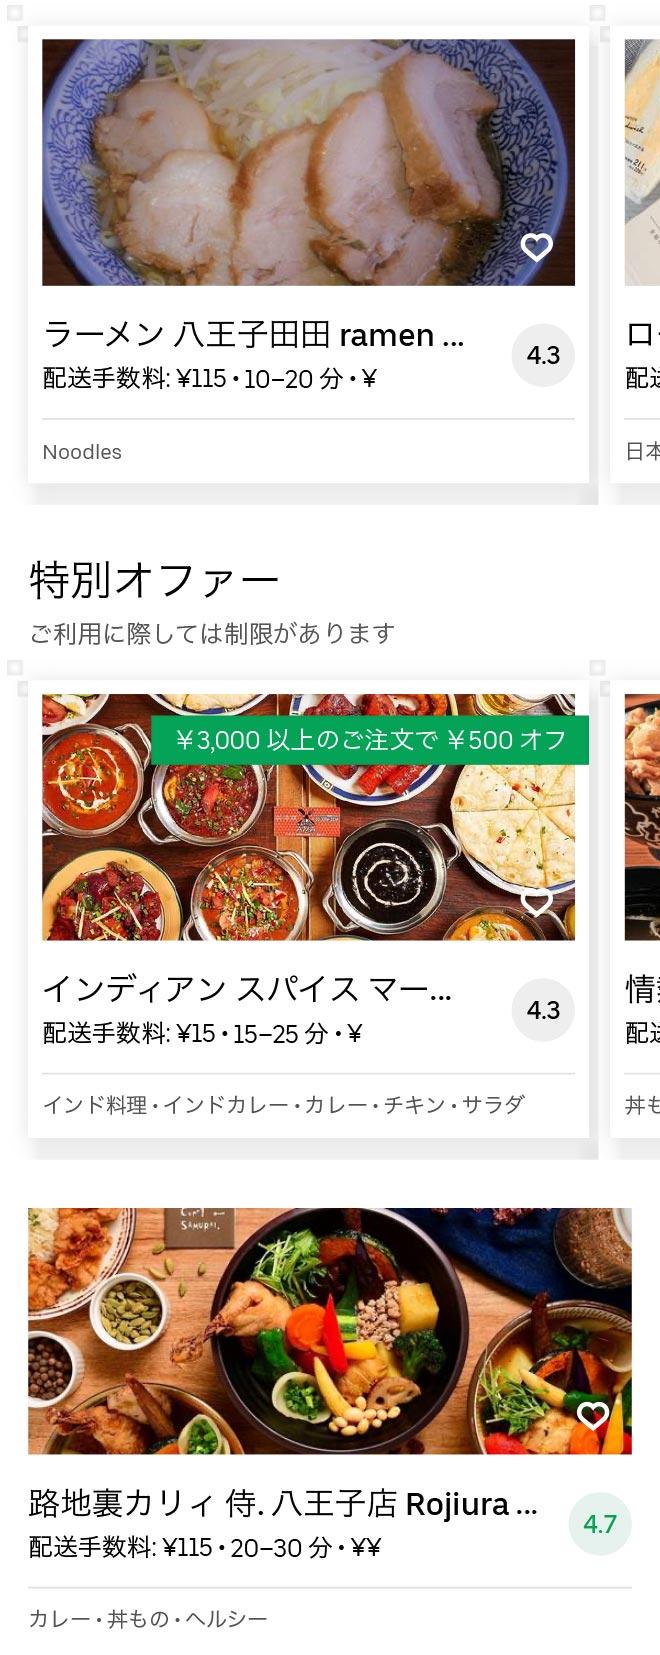 Hatioji menu 2010 02